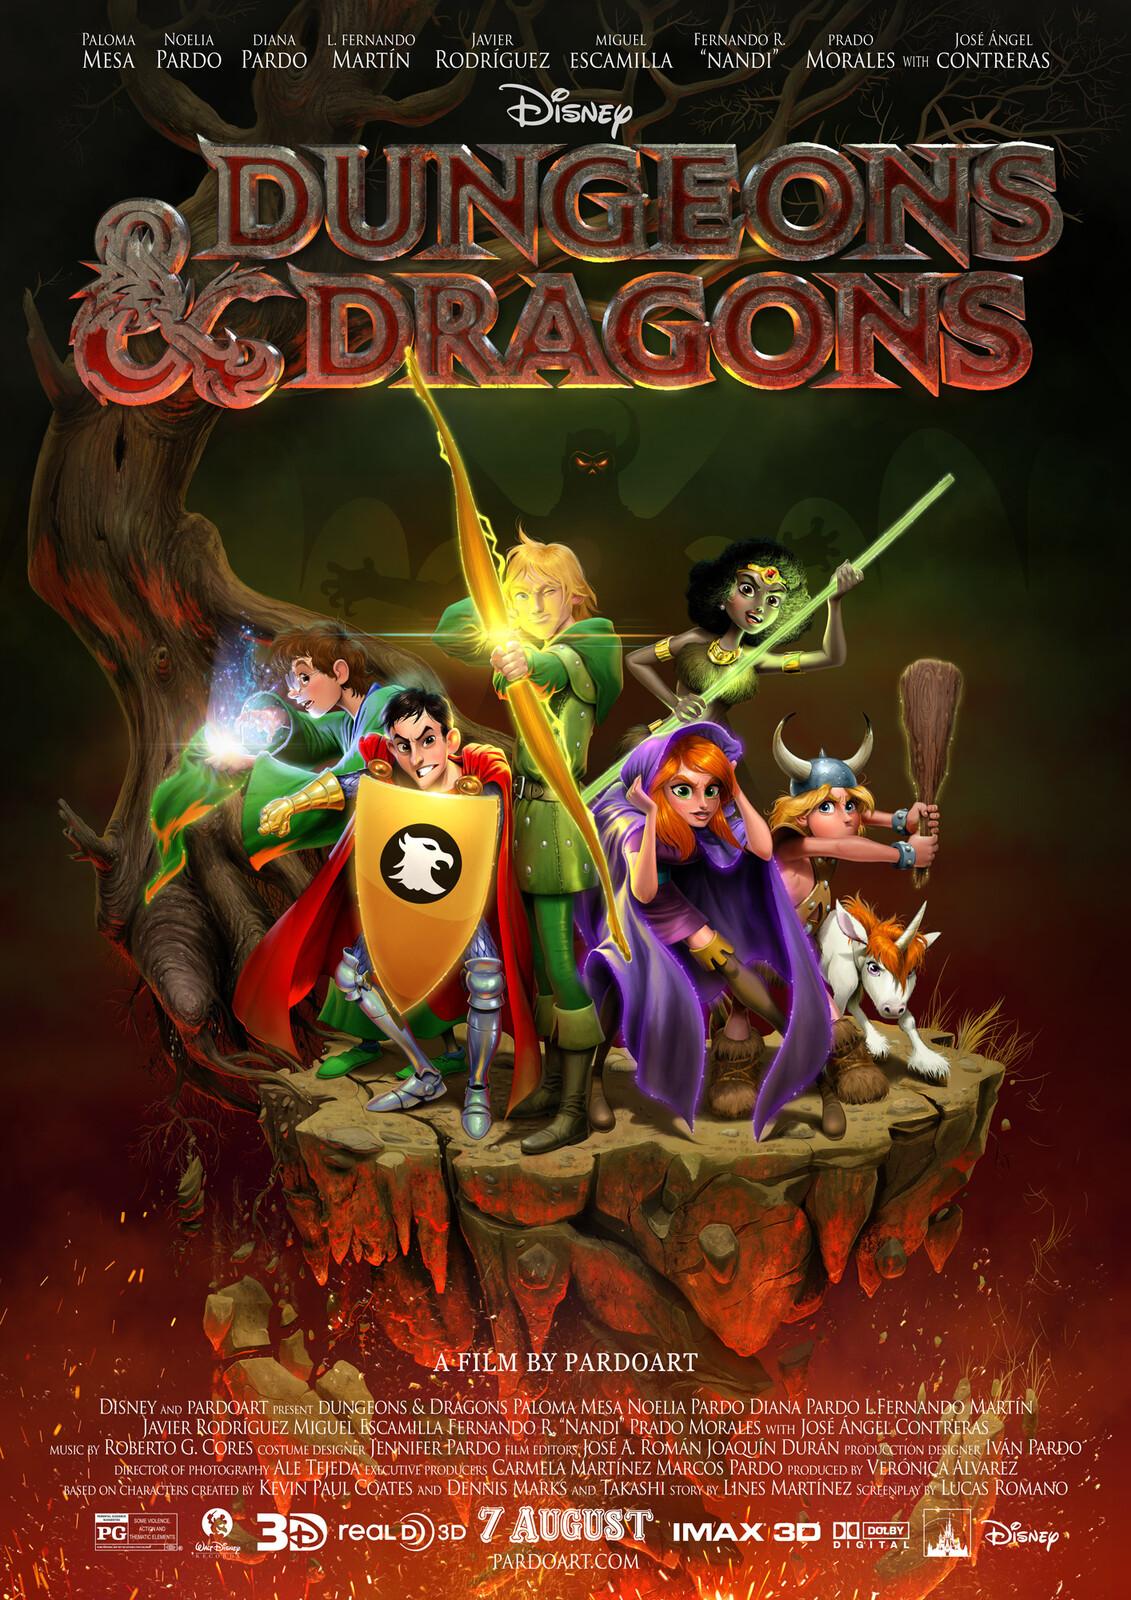 Pardoart's Dungeons & Dragons Film